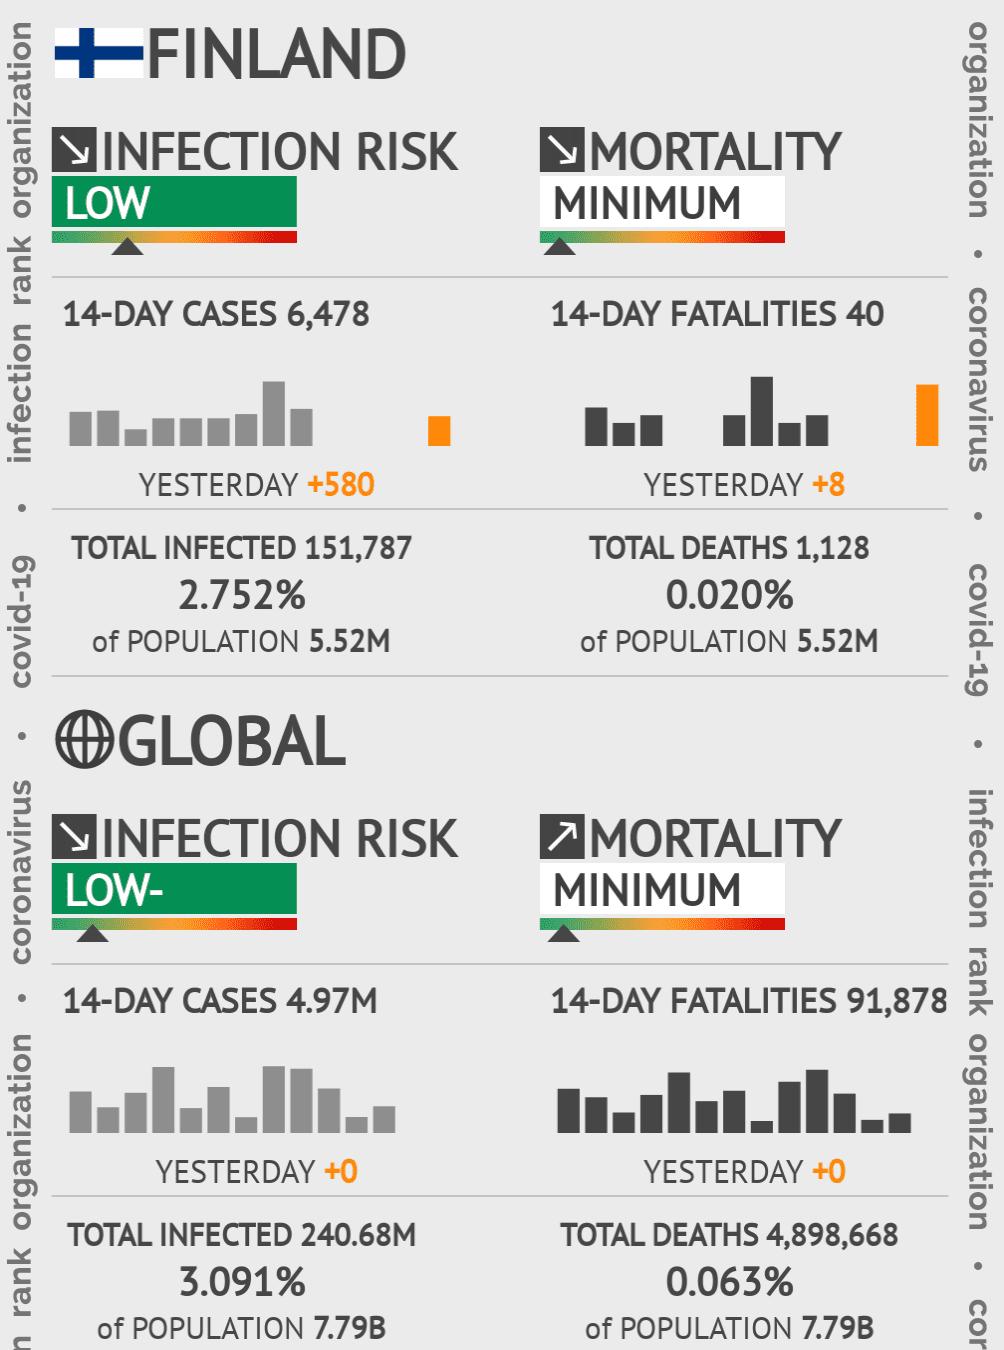 Finland Coronavirus Covid-19 Risk of Infection on January 21, 2021